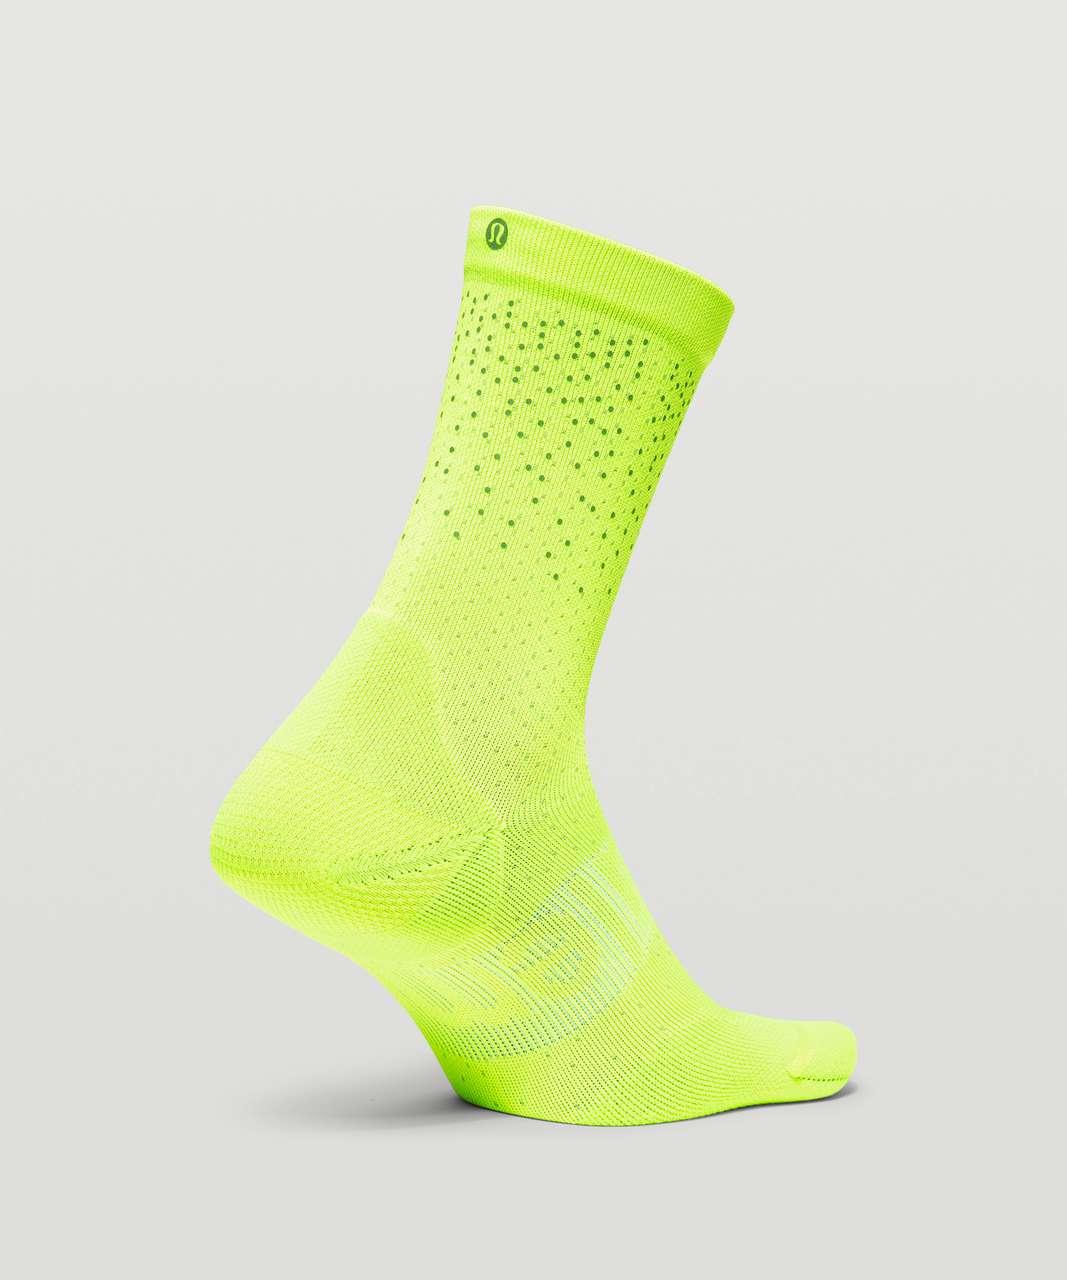 Lululemon Power Stride Crew Sock *Reflective - Highlight Yellow